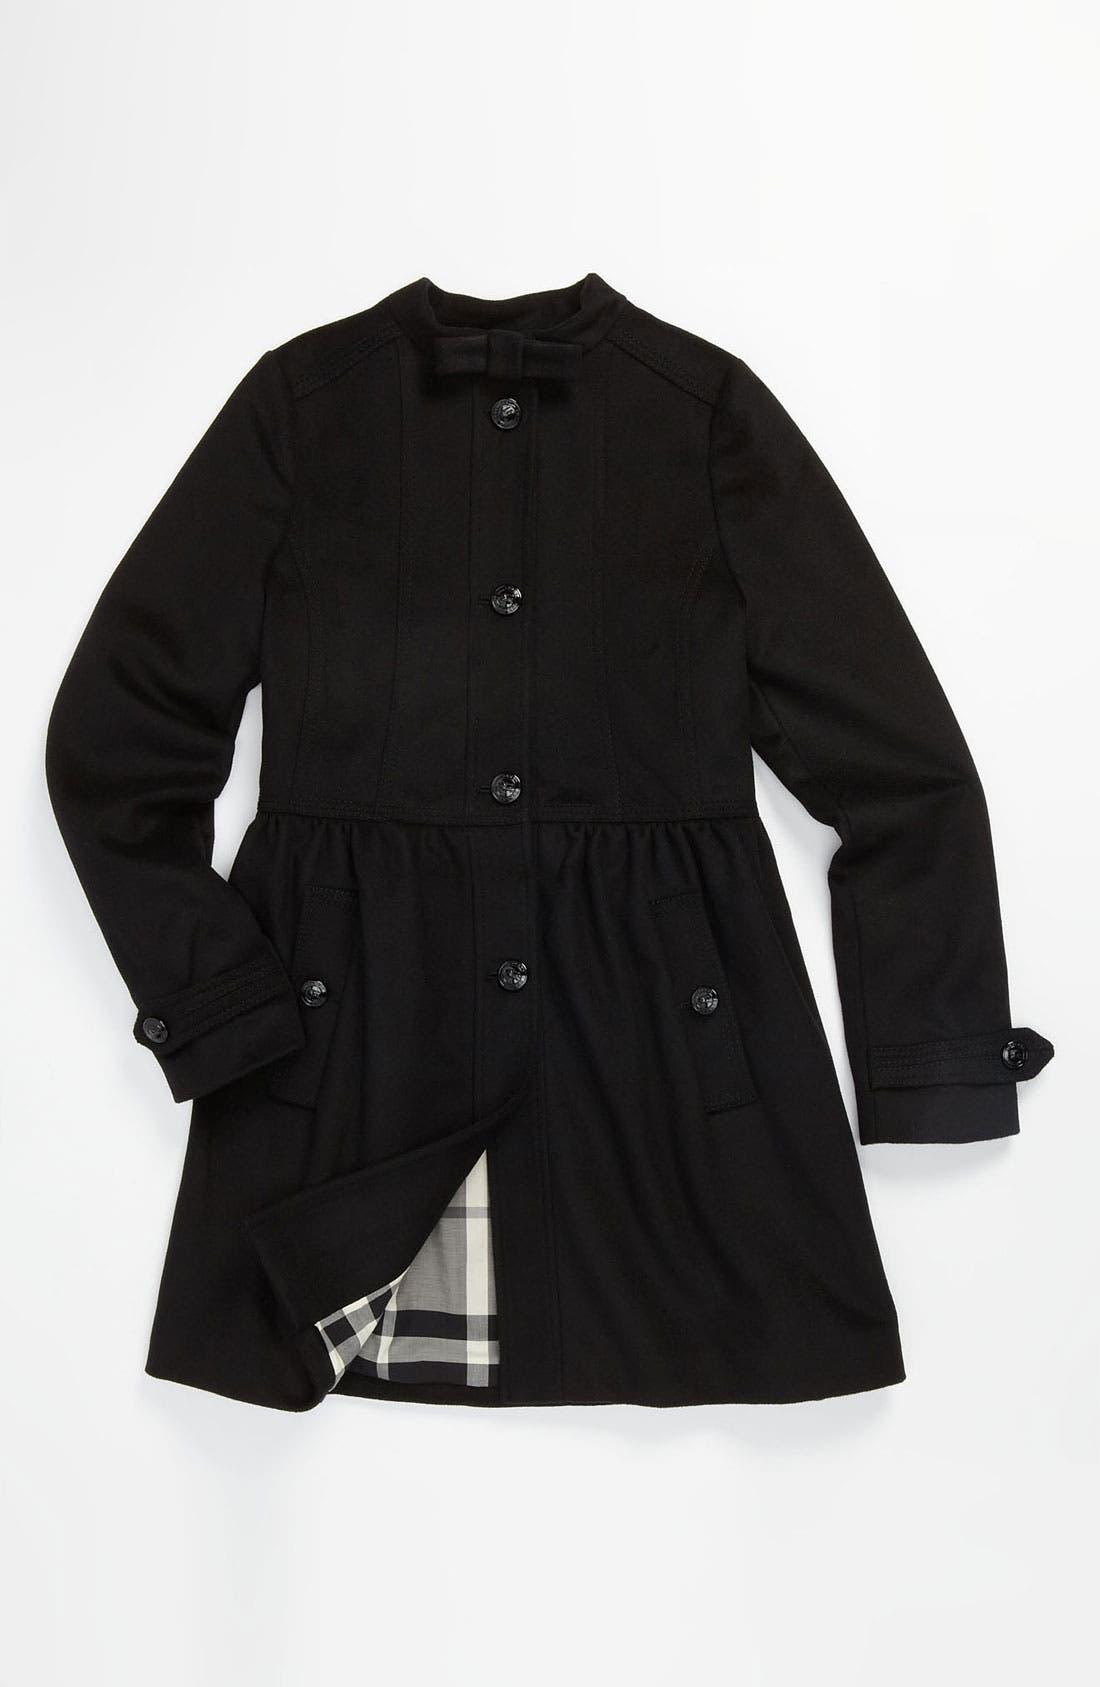 Alternate Image 1 Selected - Burberry Wool Blend Peacoat (Little Girls & Big Girls)